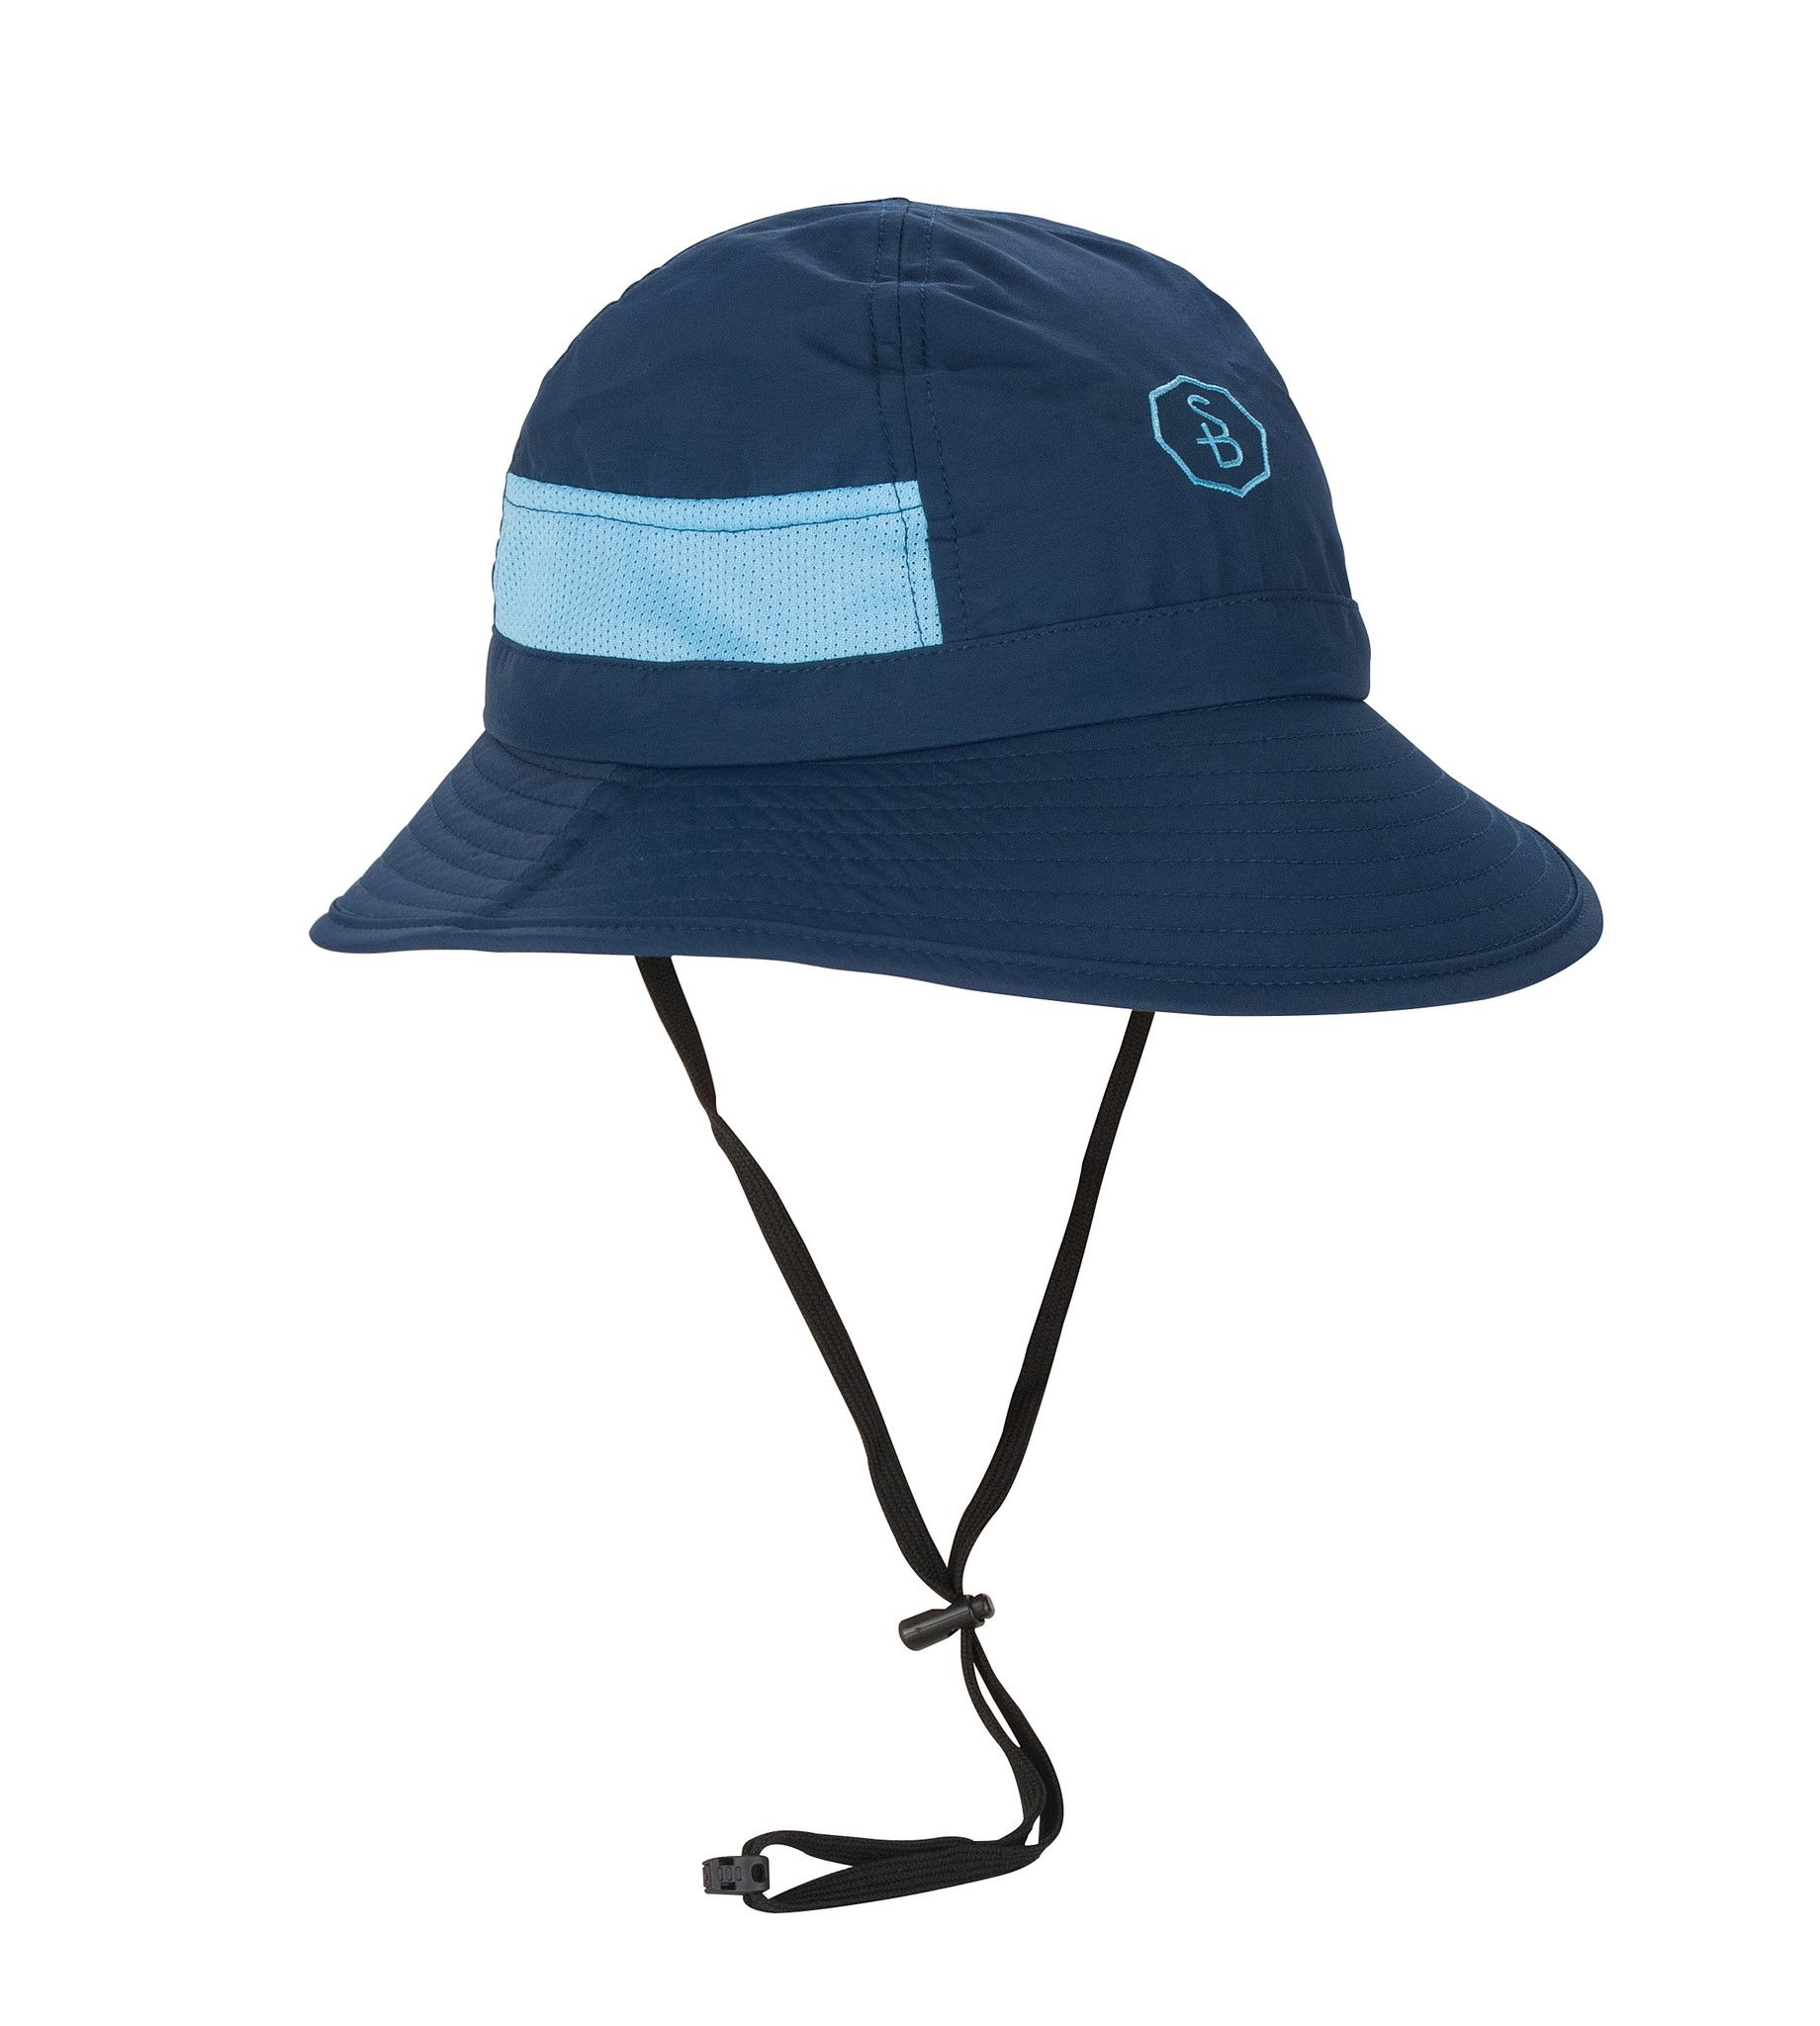 36be88dd1f4 Kids Every Day Sun Hat UPF50+ – SOLBARI Sun Protection